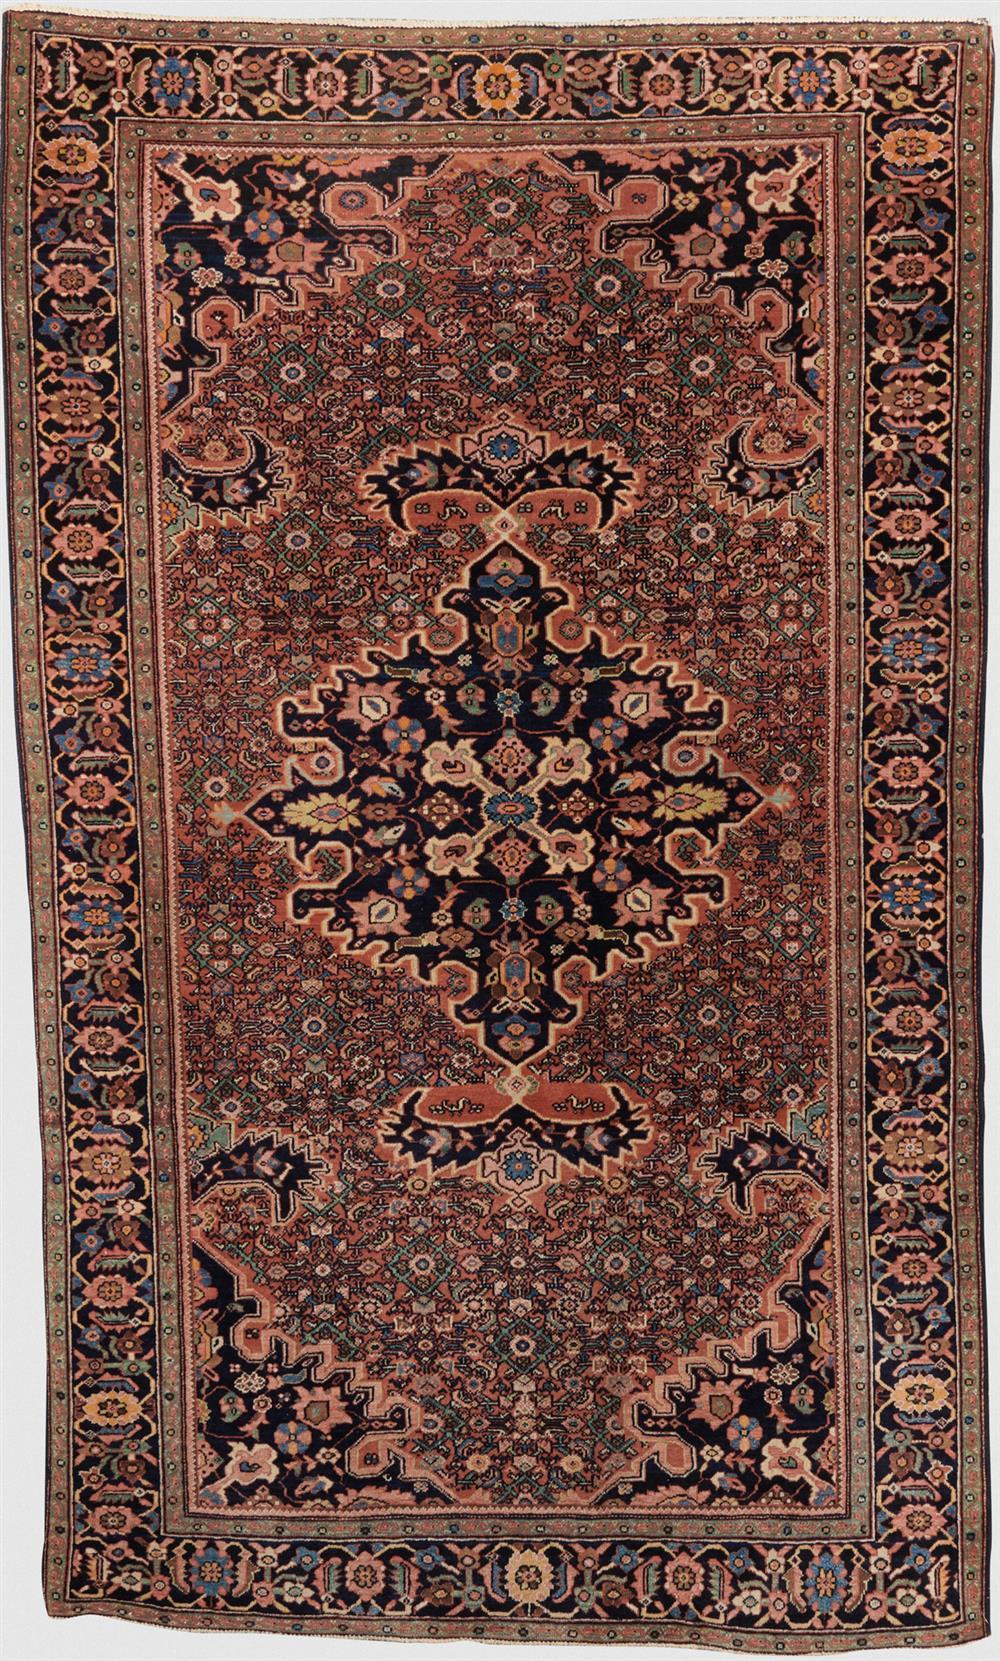 Sarouk Fereghan Rug, Persia, ca. 1900; 7 ft. 2 in. x 4 ft. 3 in.